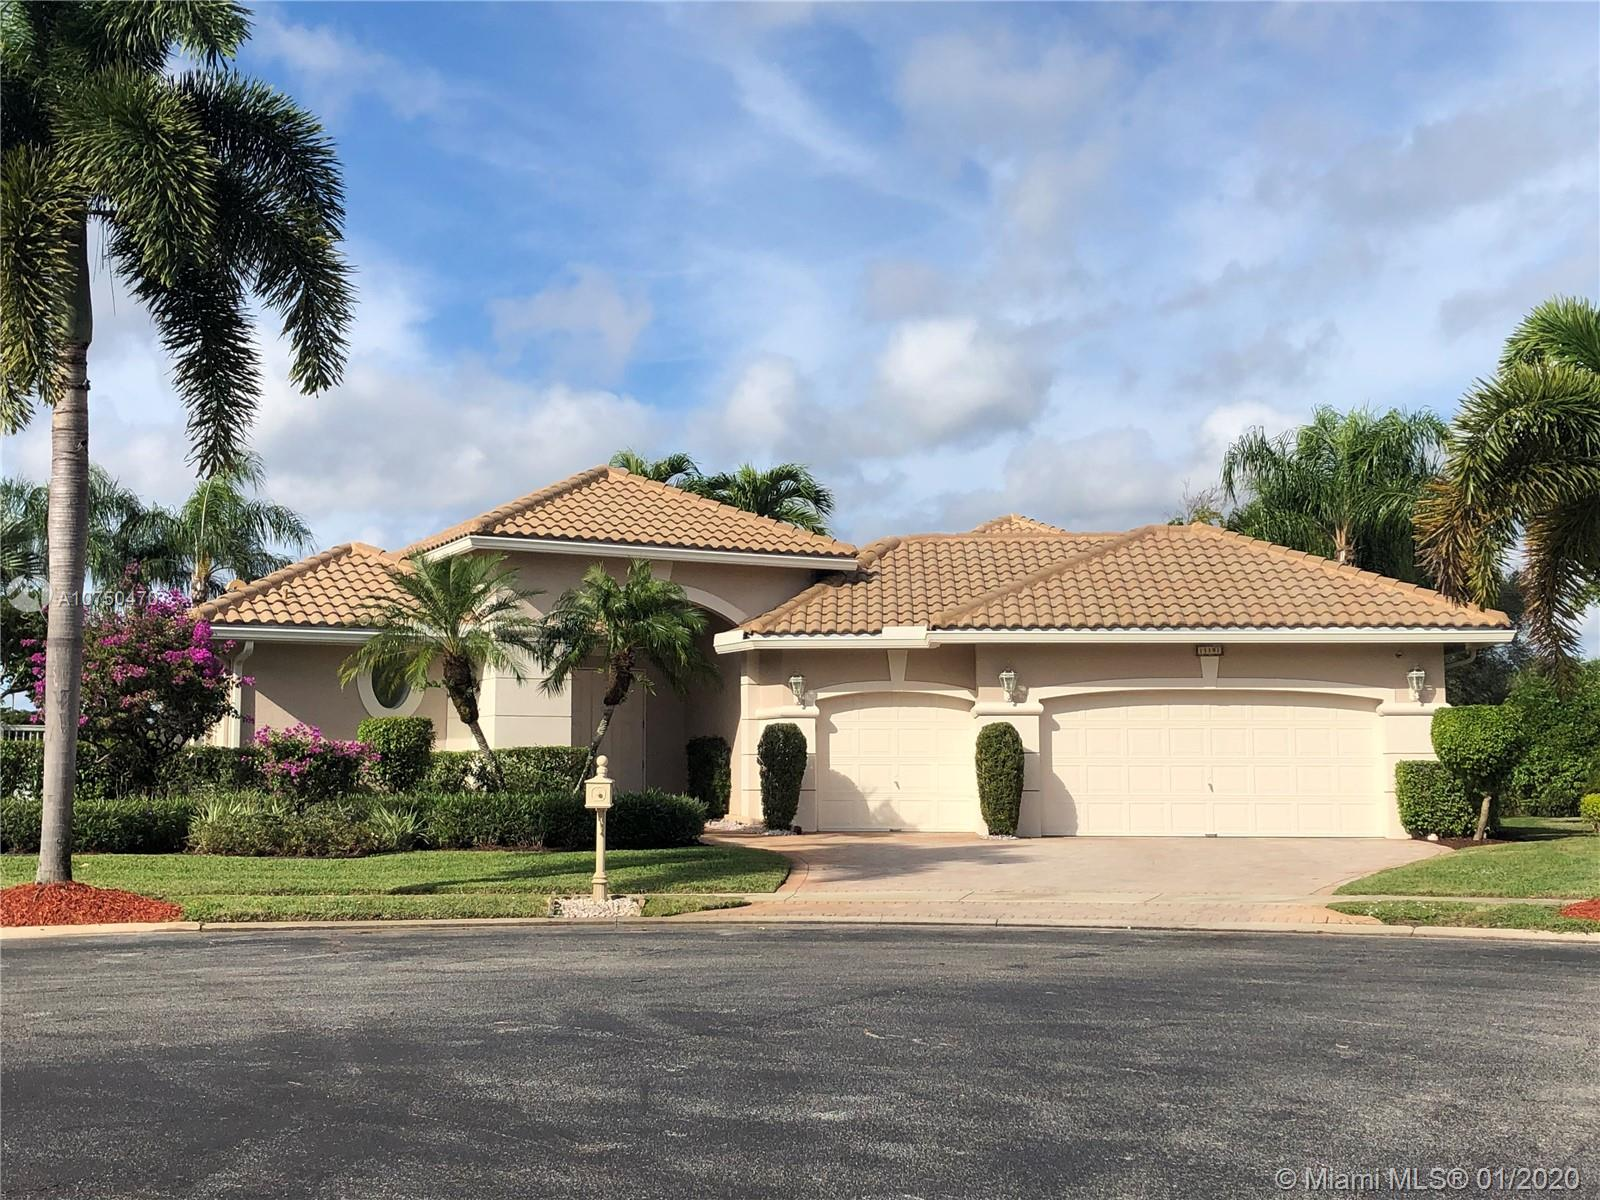 11191 Golfridge Ln, Boynton Beach, FL 33437